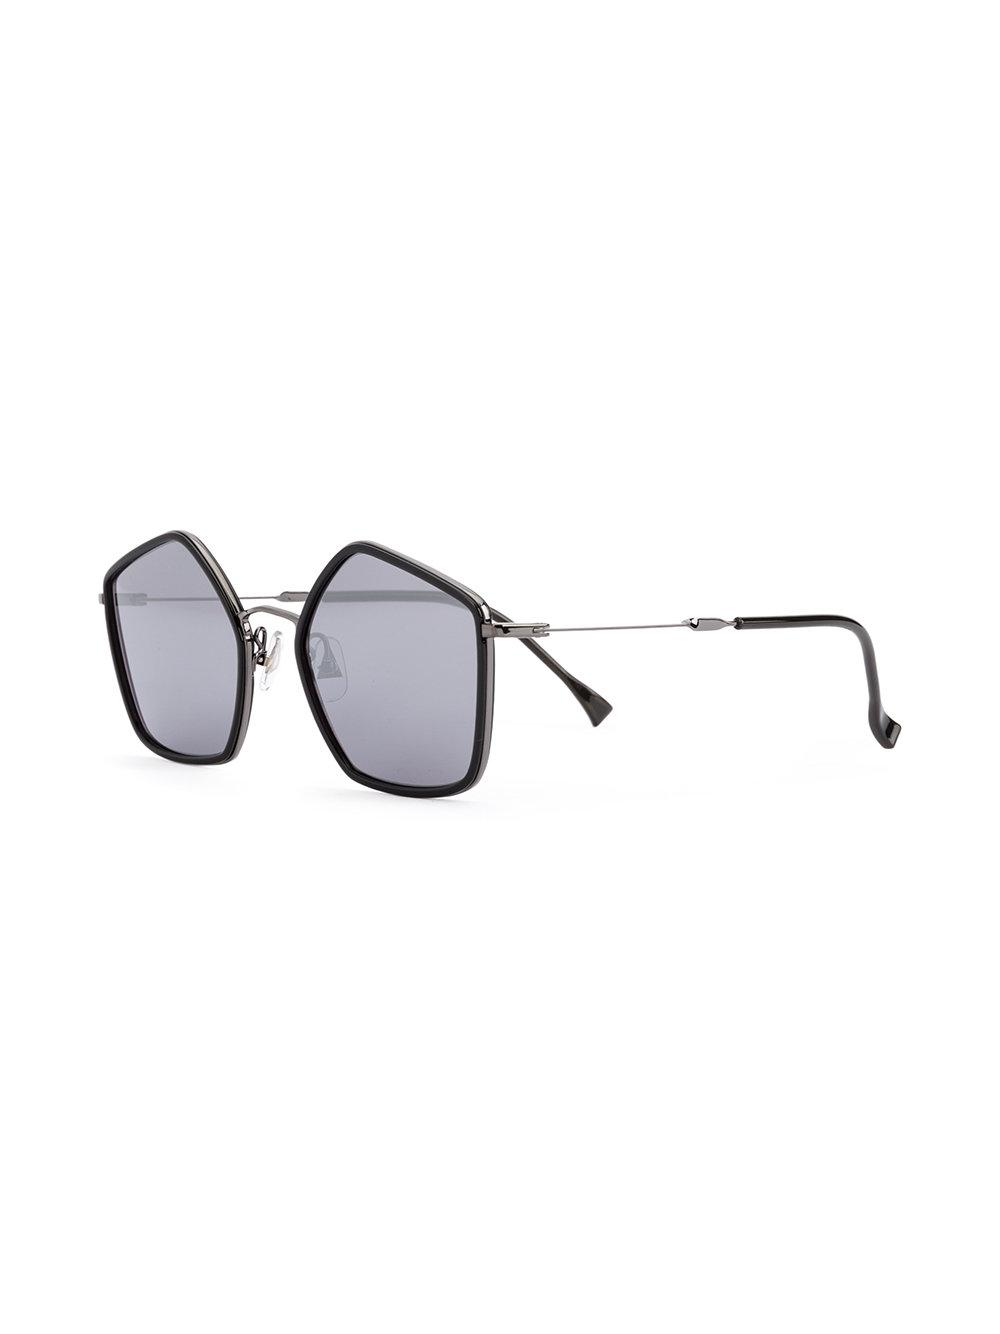 Issey Miyake Pentagon Iv Sunglasses in Black